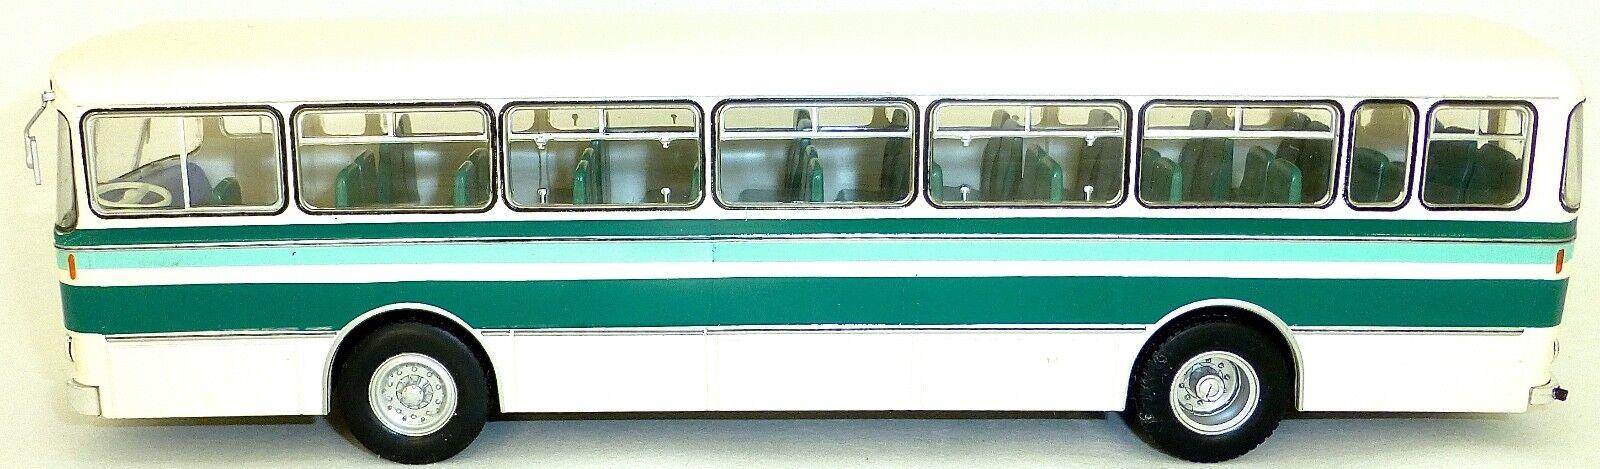 BERLIET PHL 10 GRAND RAID France France France 1966 Bus IXO 1 43 OVP NEU  ACBUS030 LB4 µ     Der Schatz des Kindes, unser Glück  edd0e2